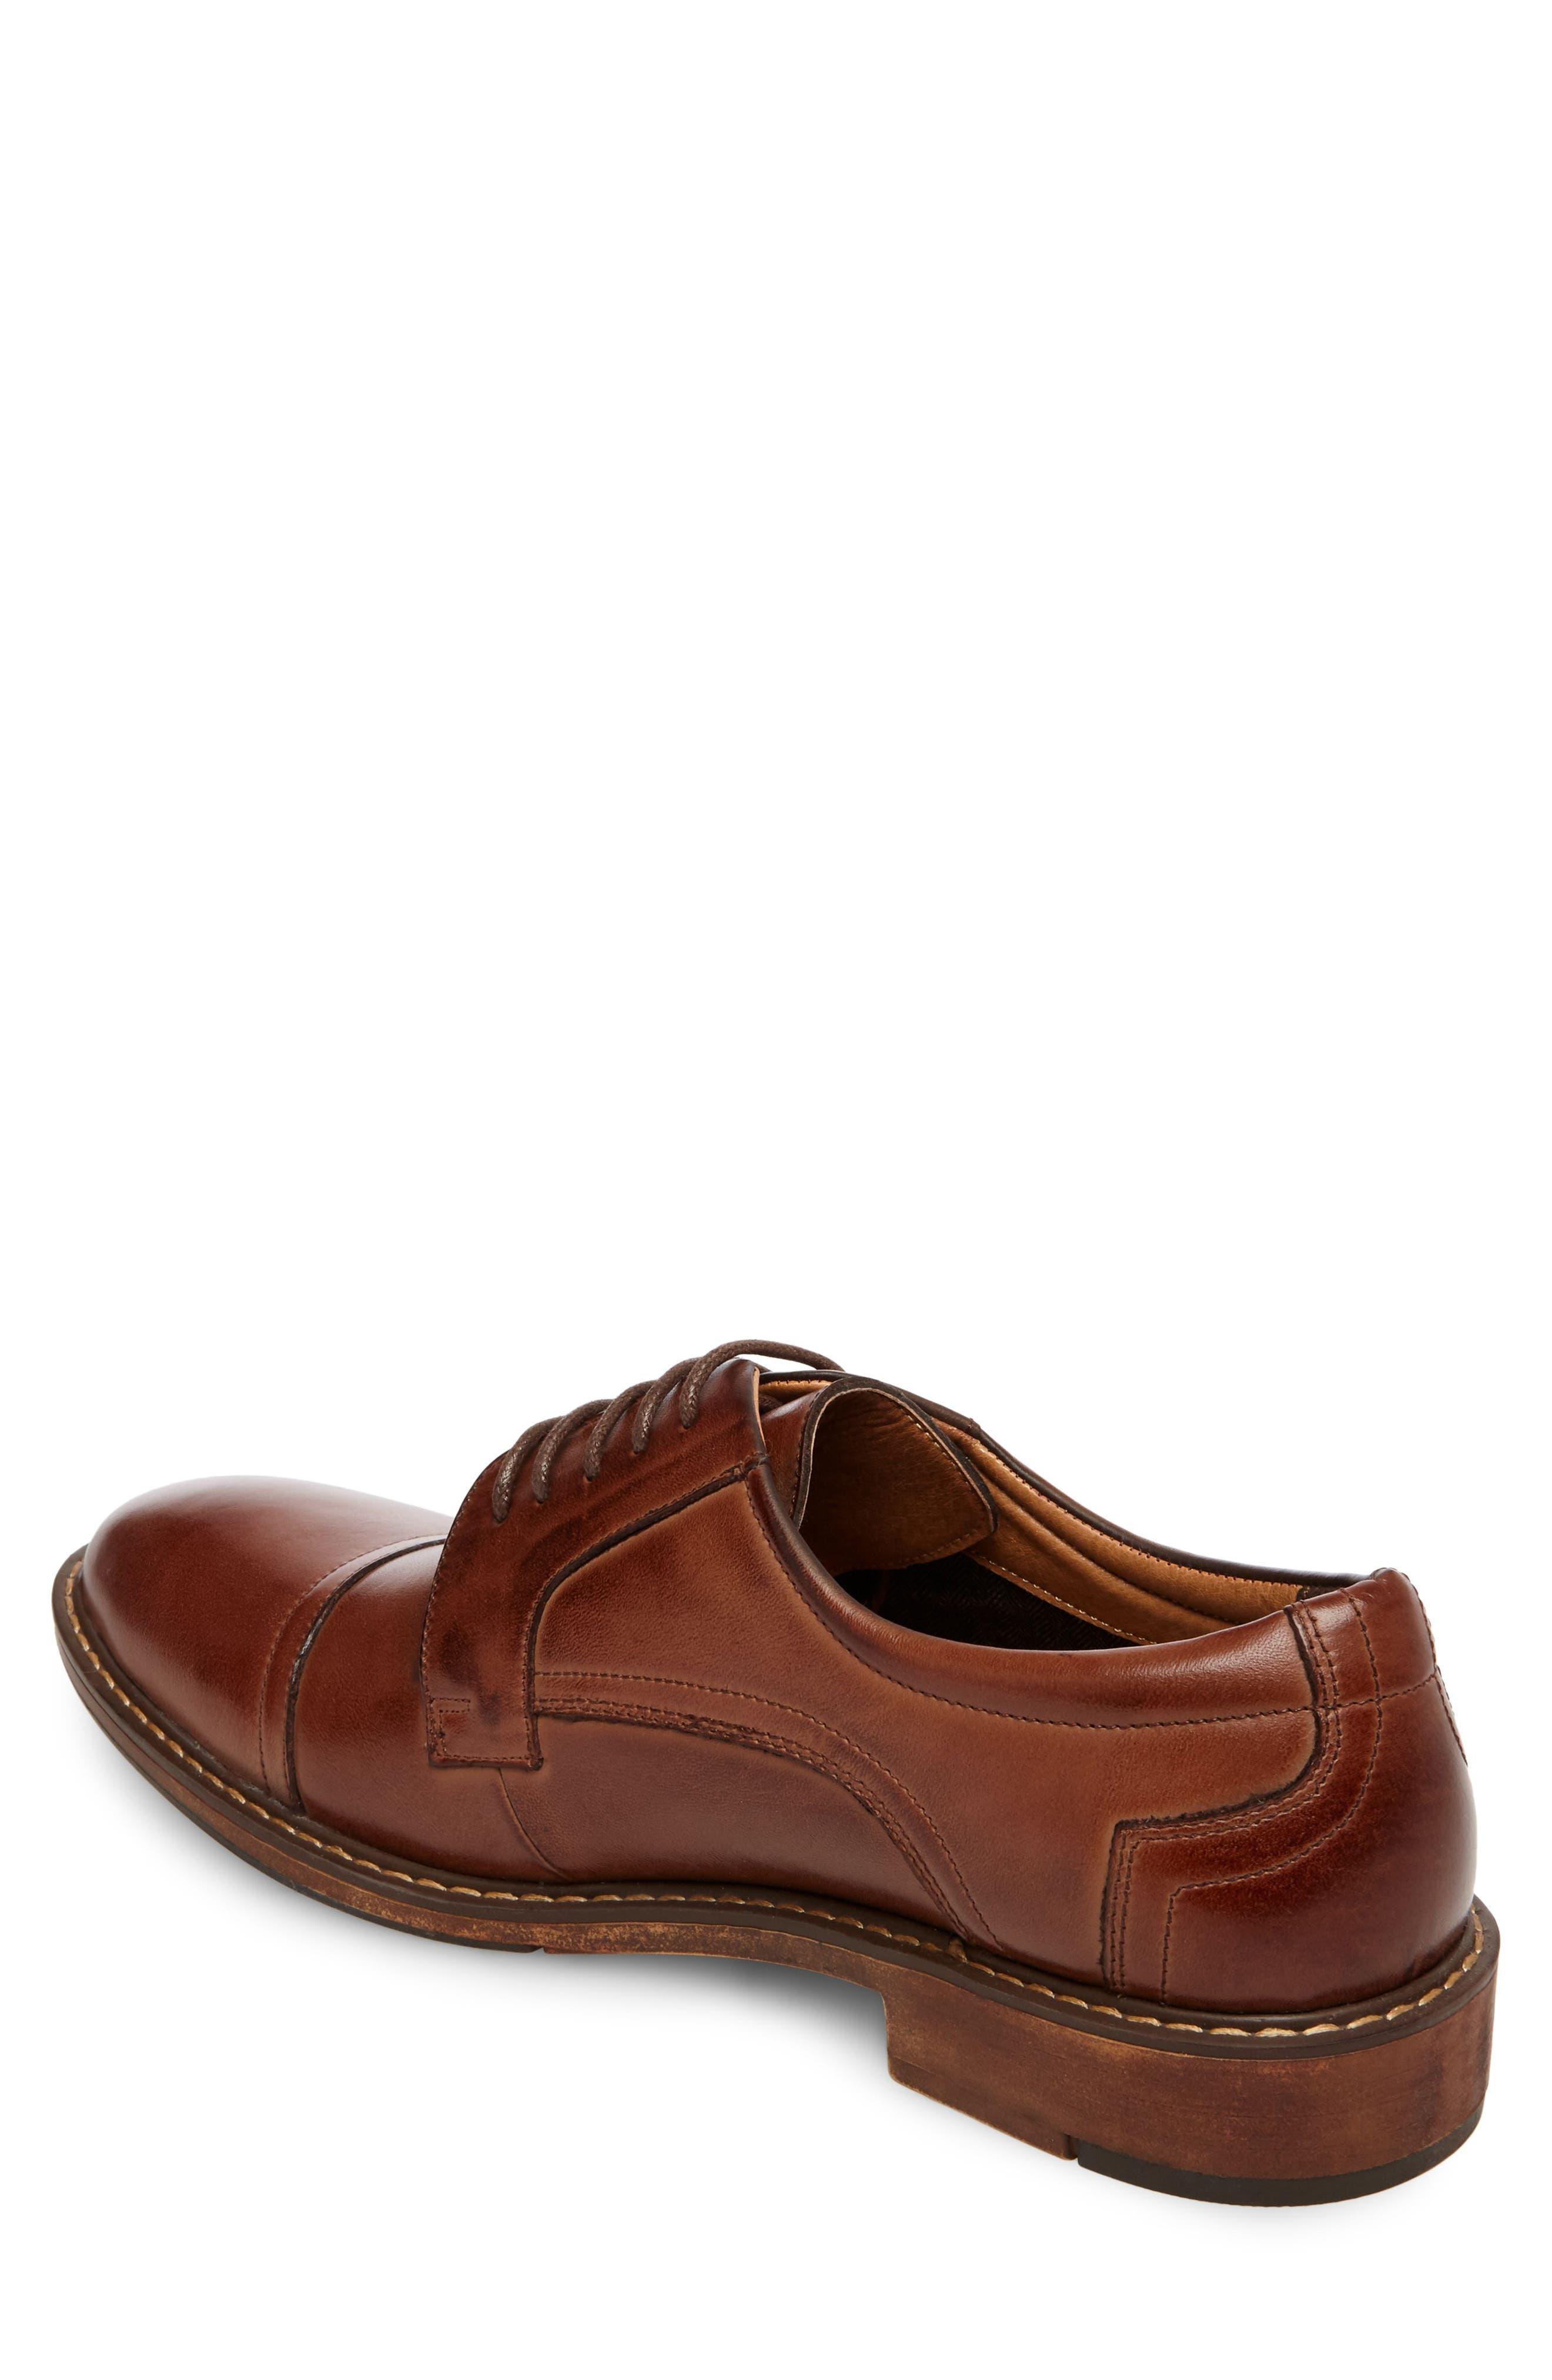 Averie Cap Toe Derby,                             Alternate thumbnail 2, color,                             Tan Leather